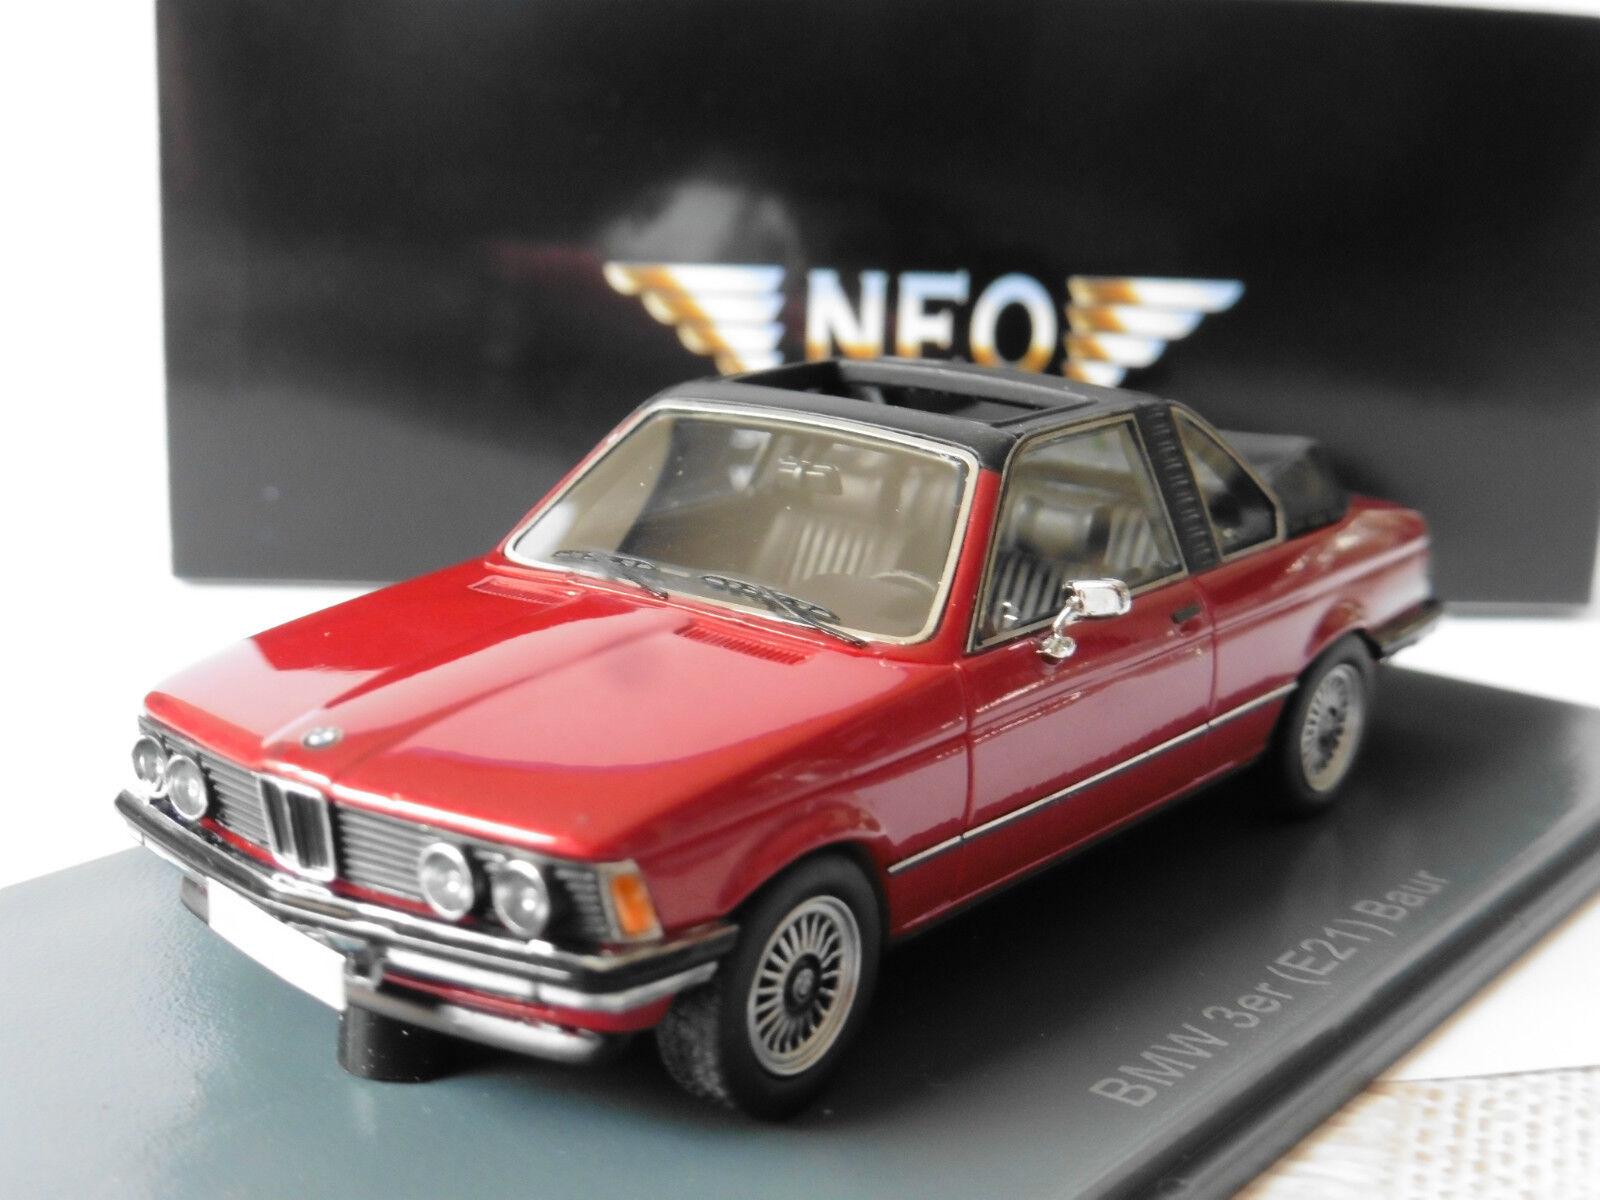 BMW 3ER E21 320 BAUR RED NEO 43289 1 43 CABRIOLET 1977 CONgreenIBLE red red